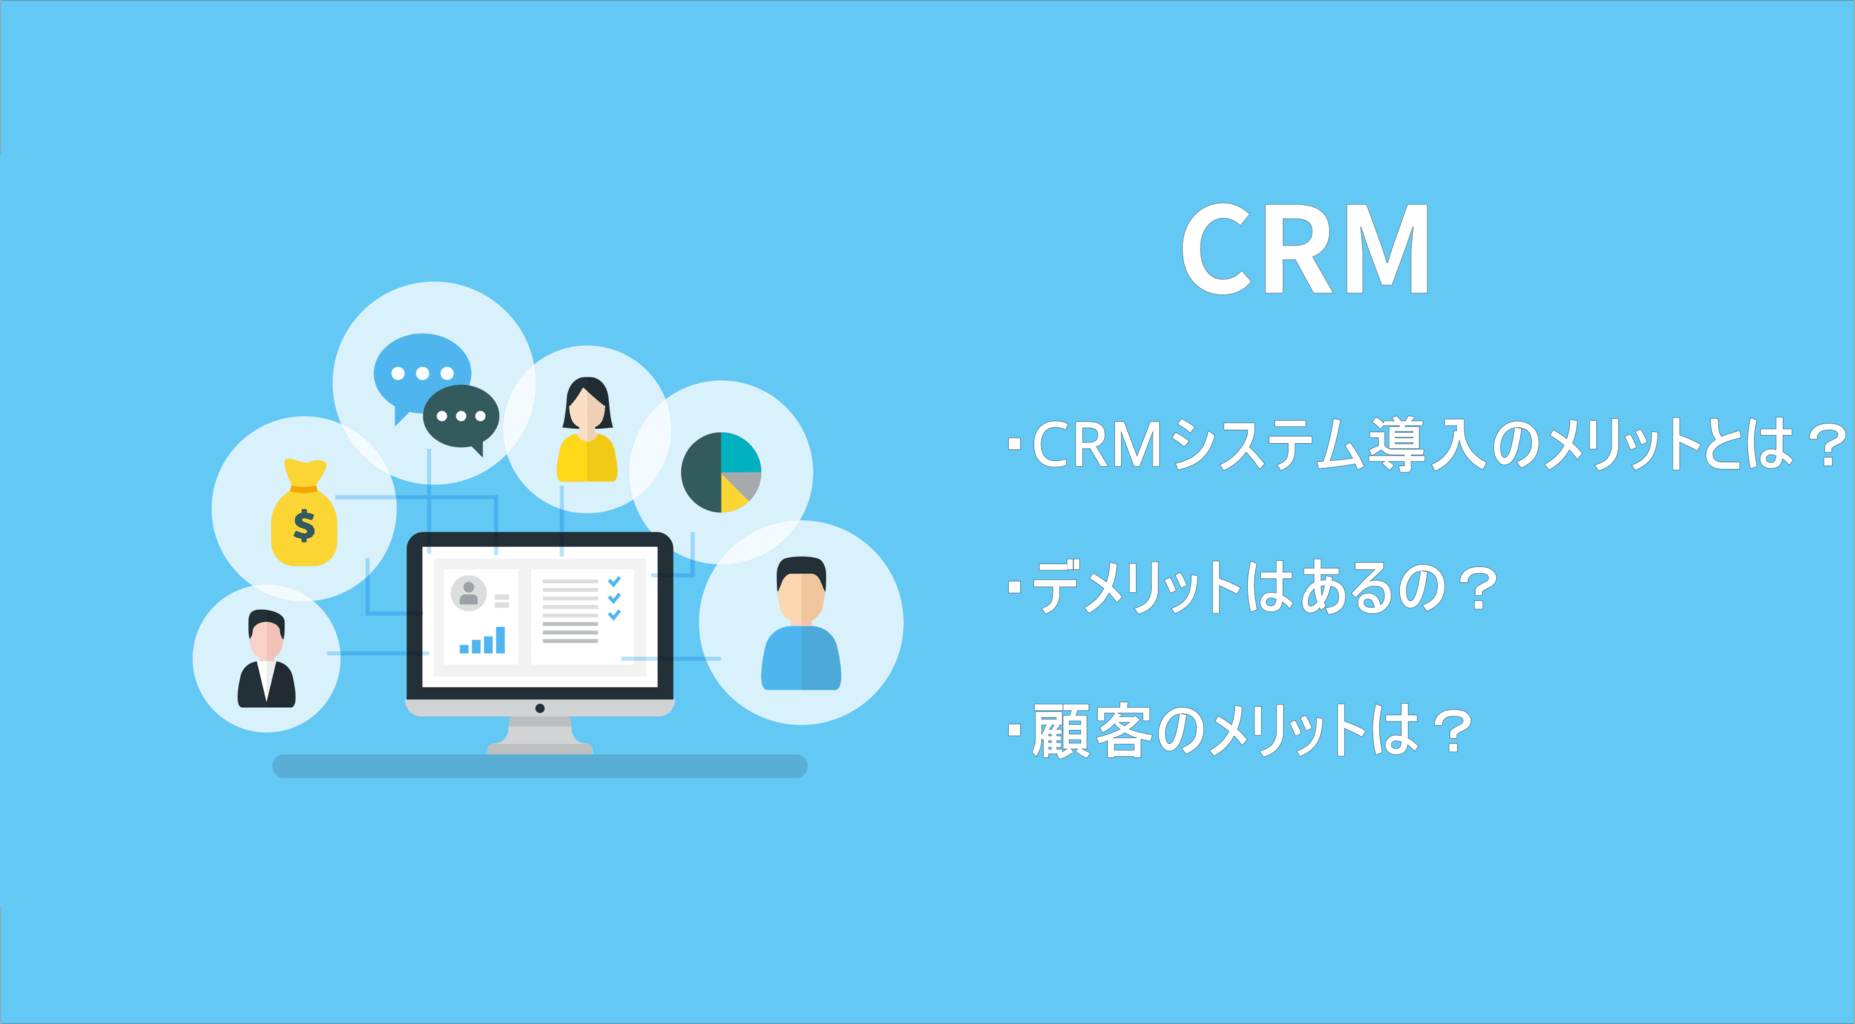 CRMを導入するメリットとデメリットとは?詳しく解説!